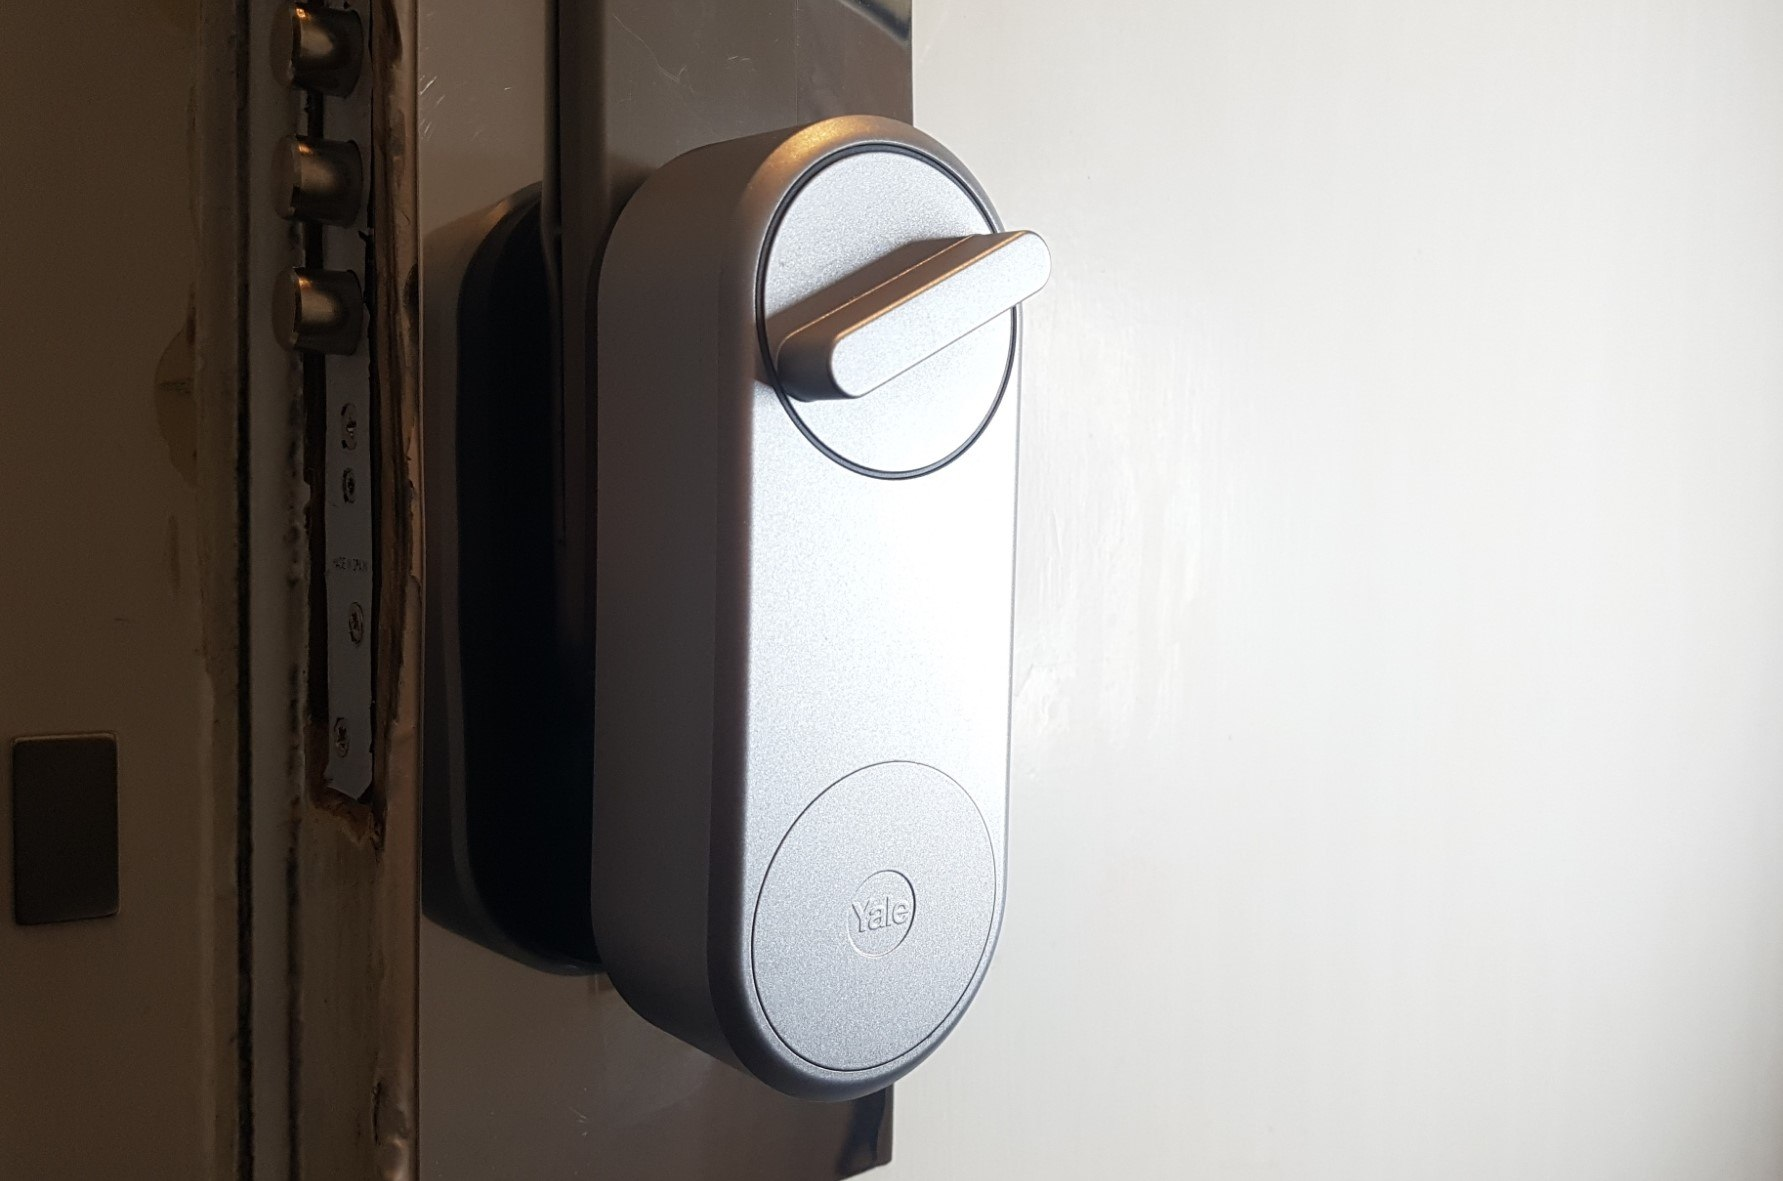 Cerradura inteligente keyless Linus Smart de Yale